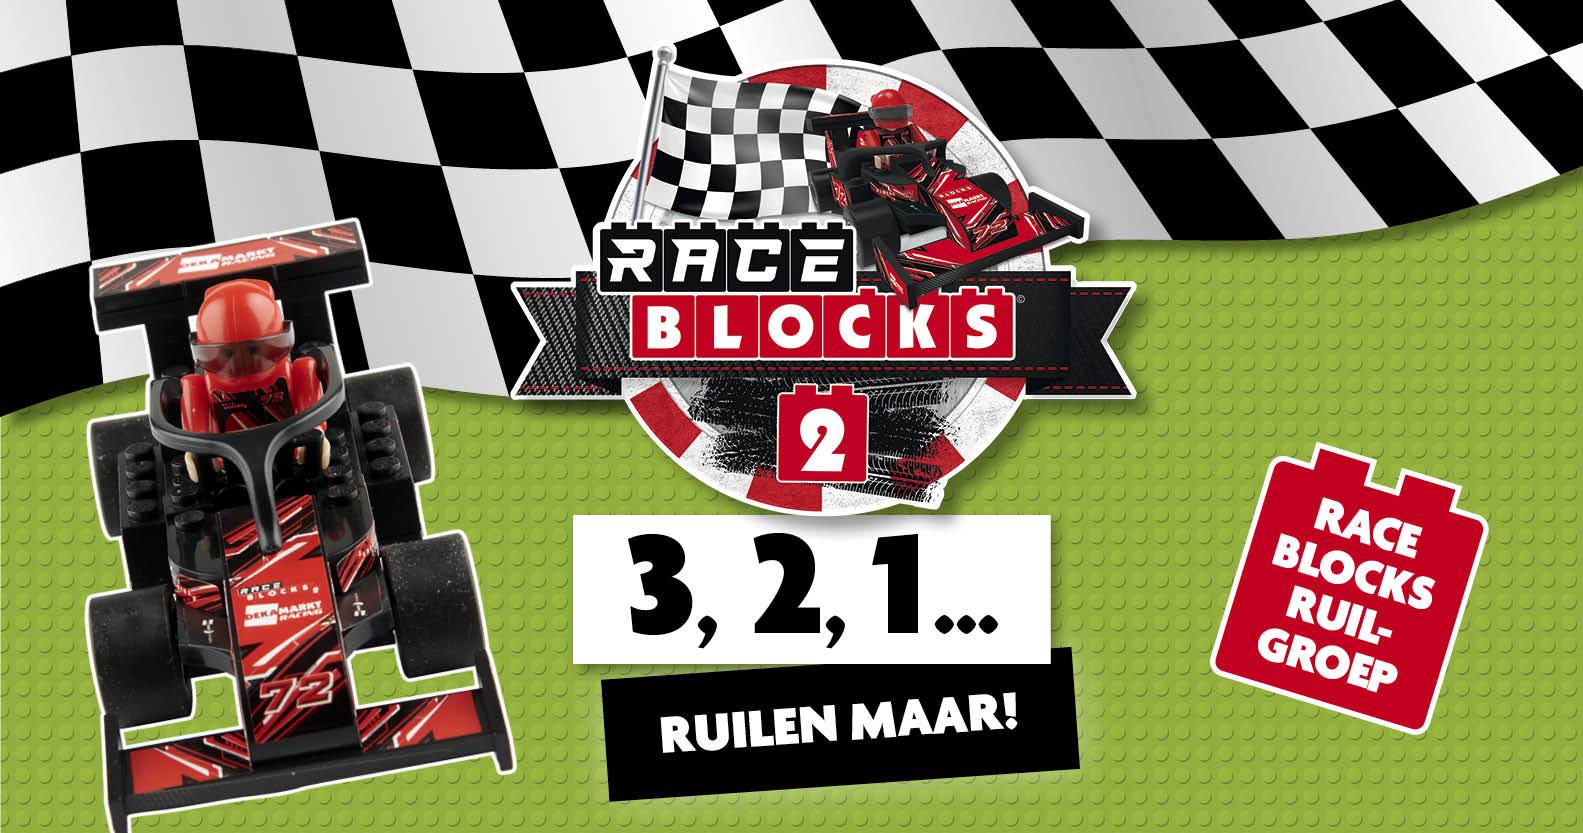 RaceBlocks ruilgroep-5